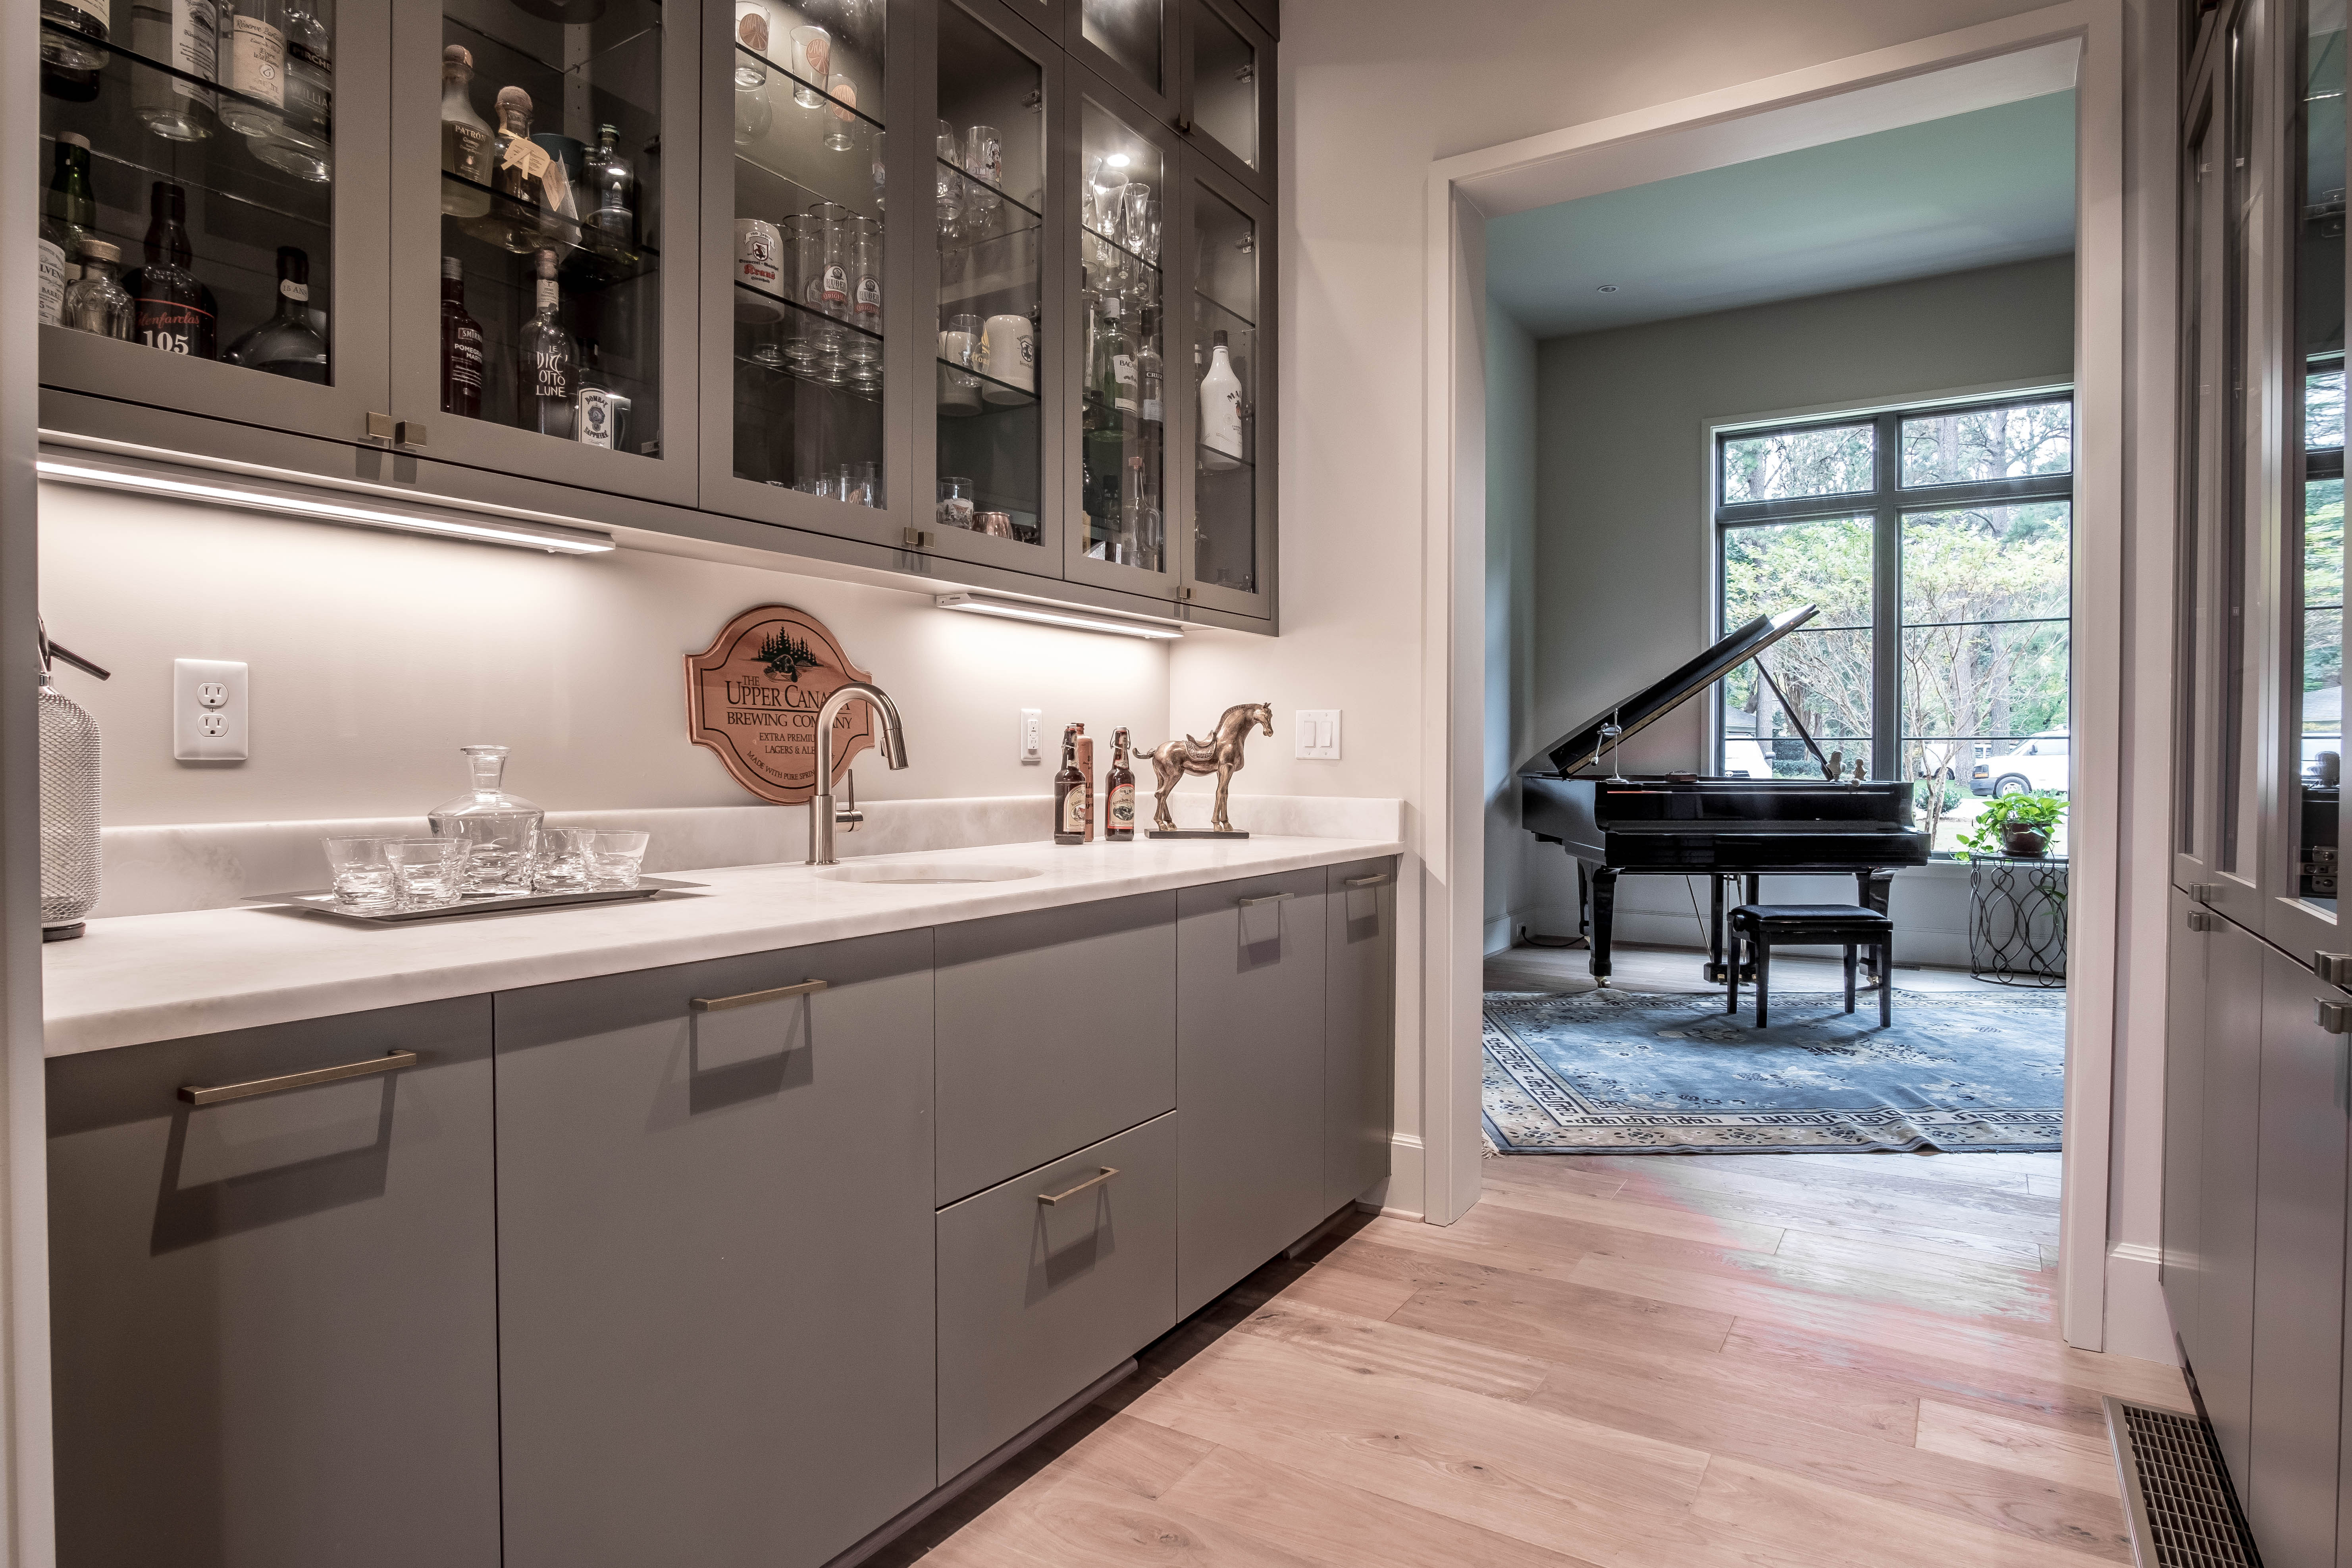 hardwood floor repair charlotte nc of hardwood creations inc custom cabinetry fine furniture regarding 401 fesbrook ct 27